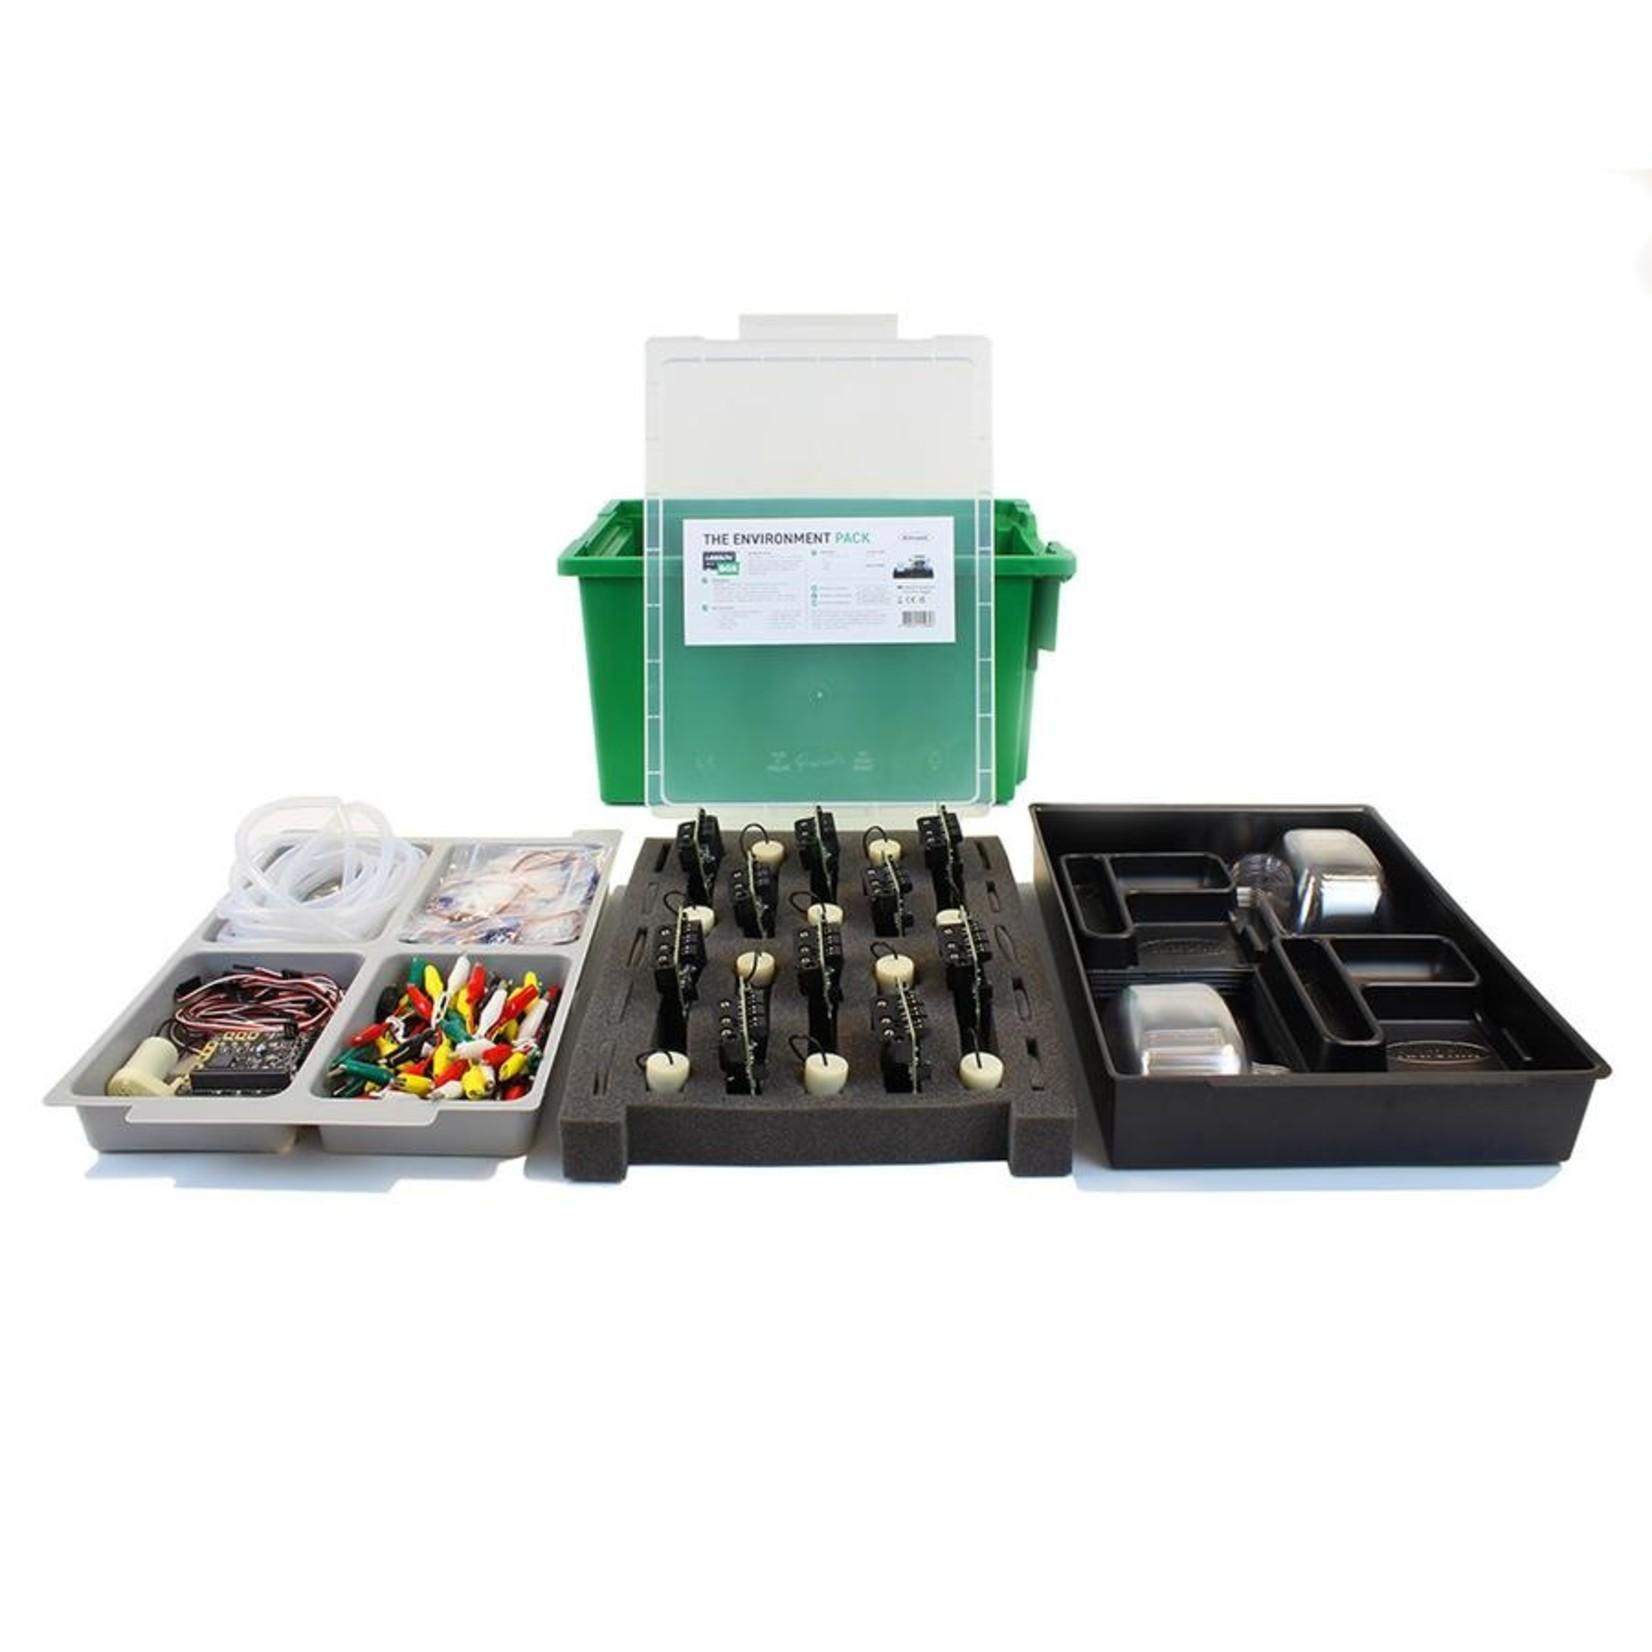 Kitronik Lesson in a Box - The Environment kit for BBC micro:bit